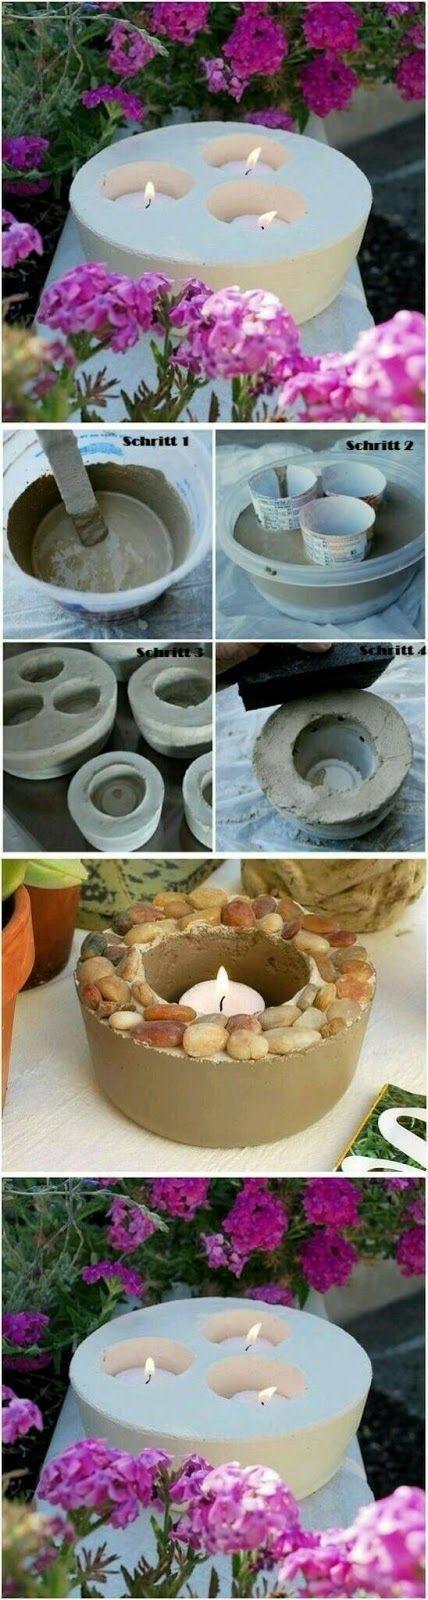 Usando cemento o concreto puedes hacer hermosos proyectos decorativos para tu casa o jardín. En esta ocasión te mostraremos como hacer port... #concretefurniture